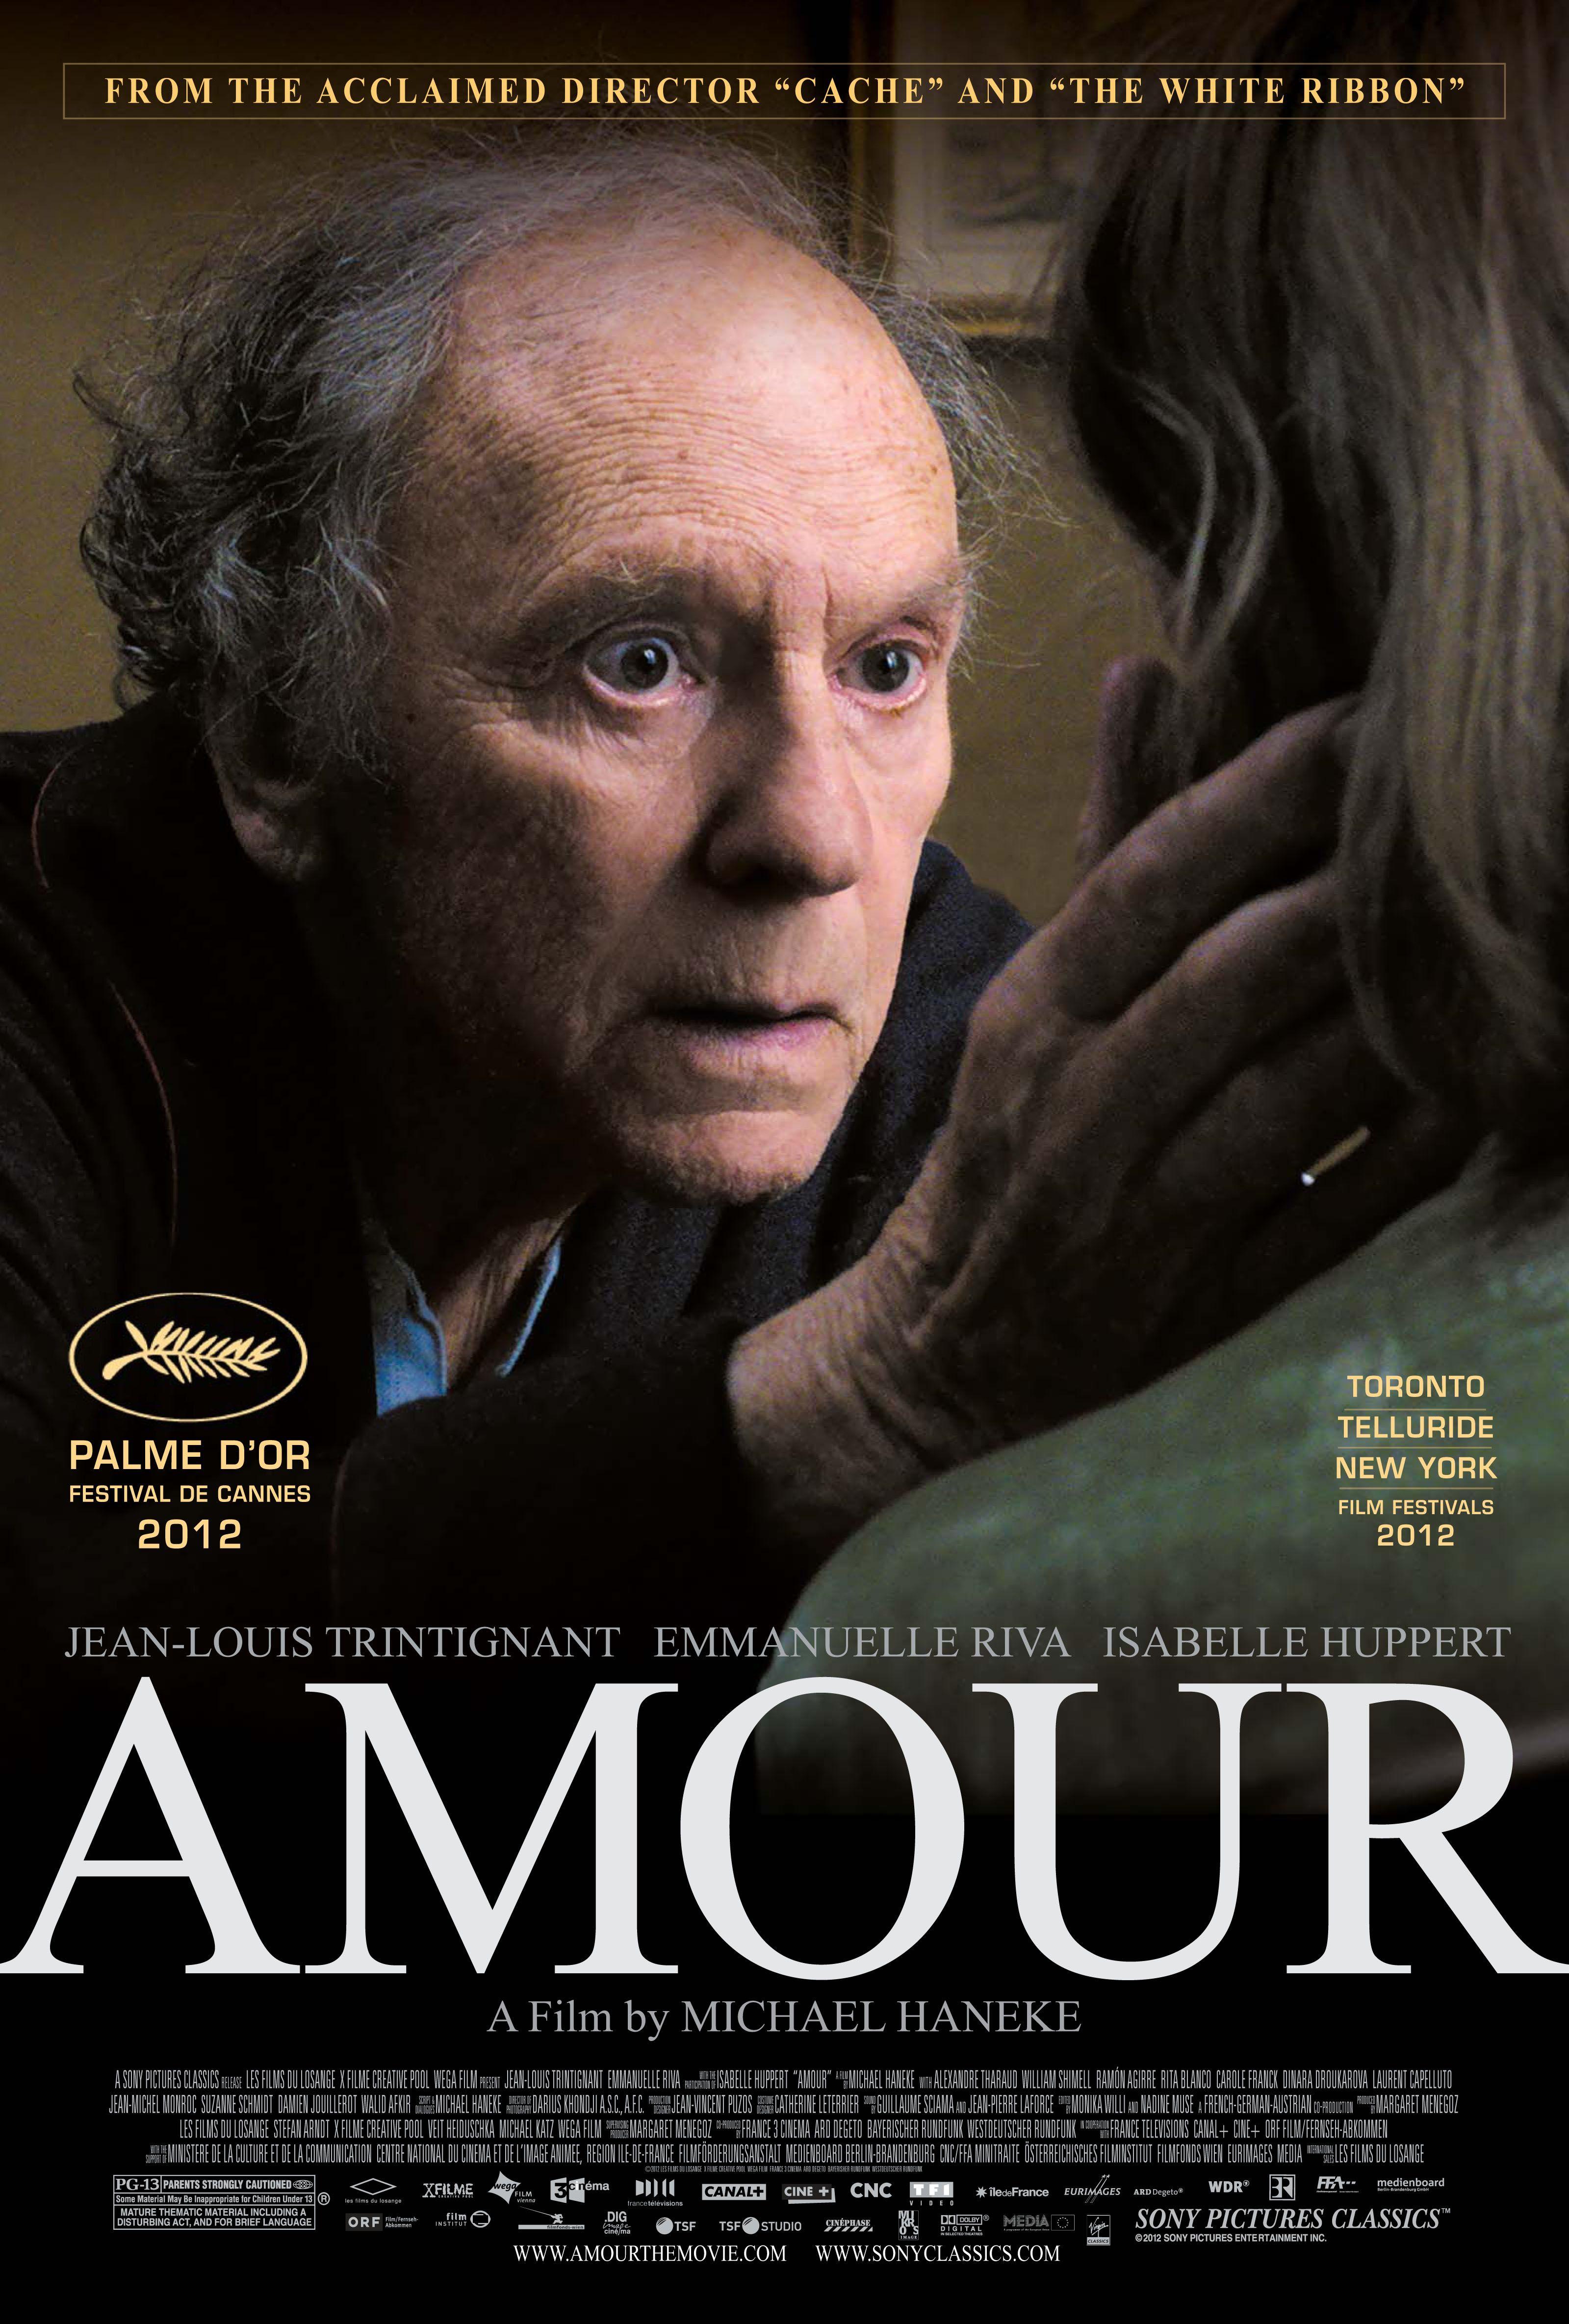 Amour (2012) by Michael Haneke